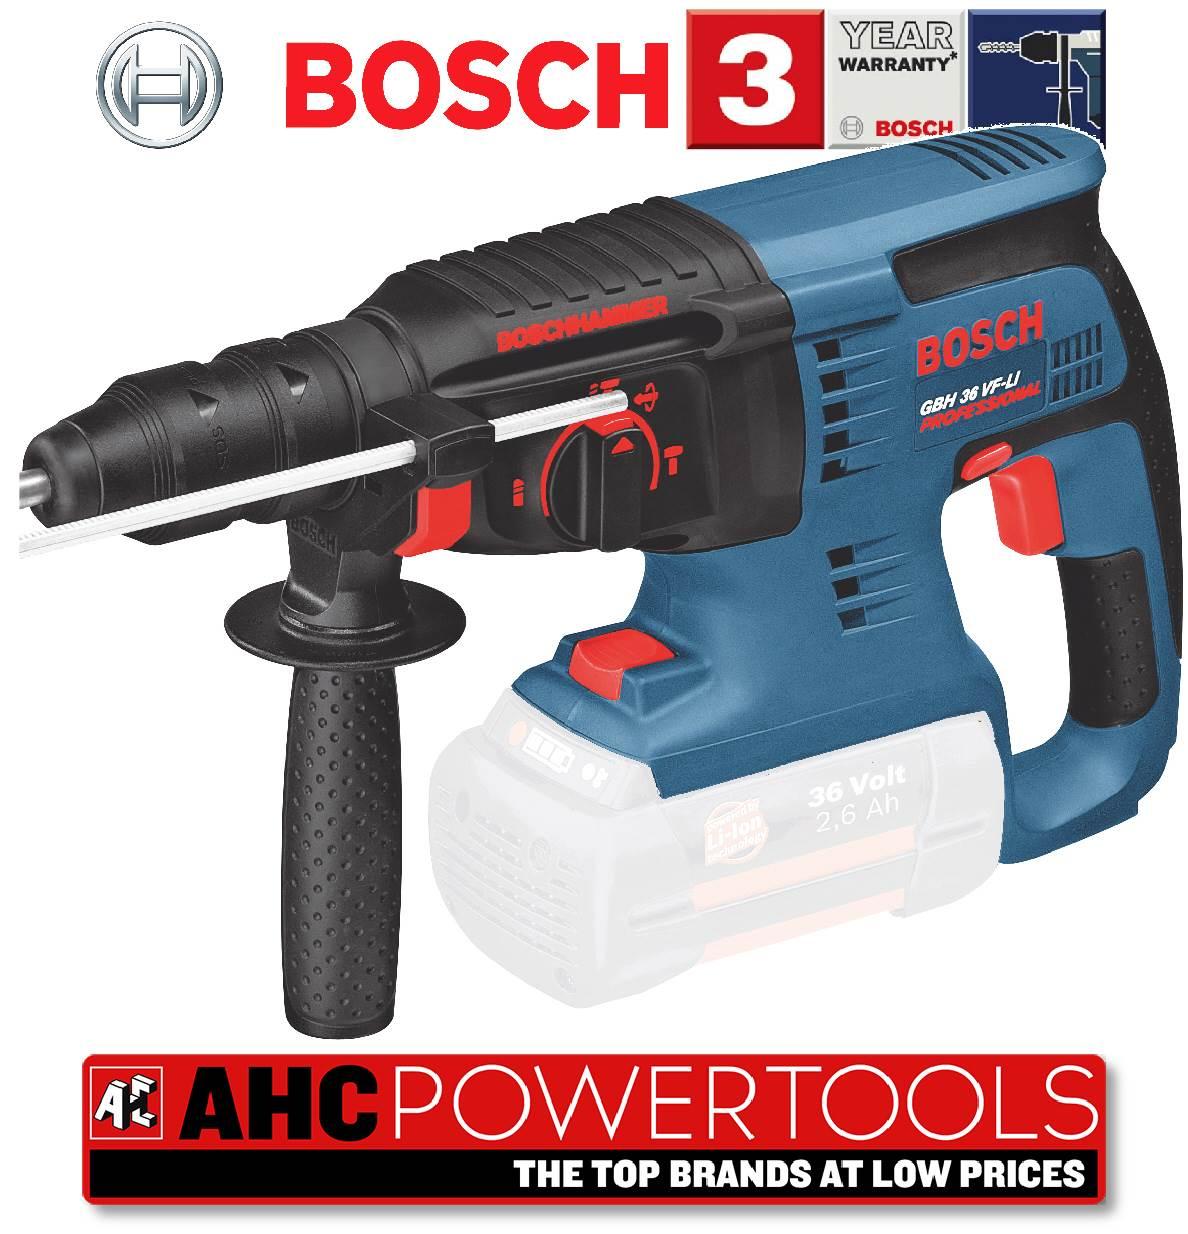 bosch gbh 36v sds rotary hammer drill gbh 36 vf li. Black Bedroom Furniture Sets. Home Design Ideas